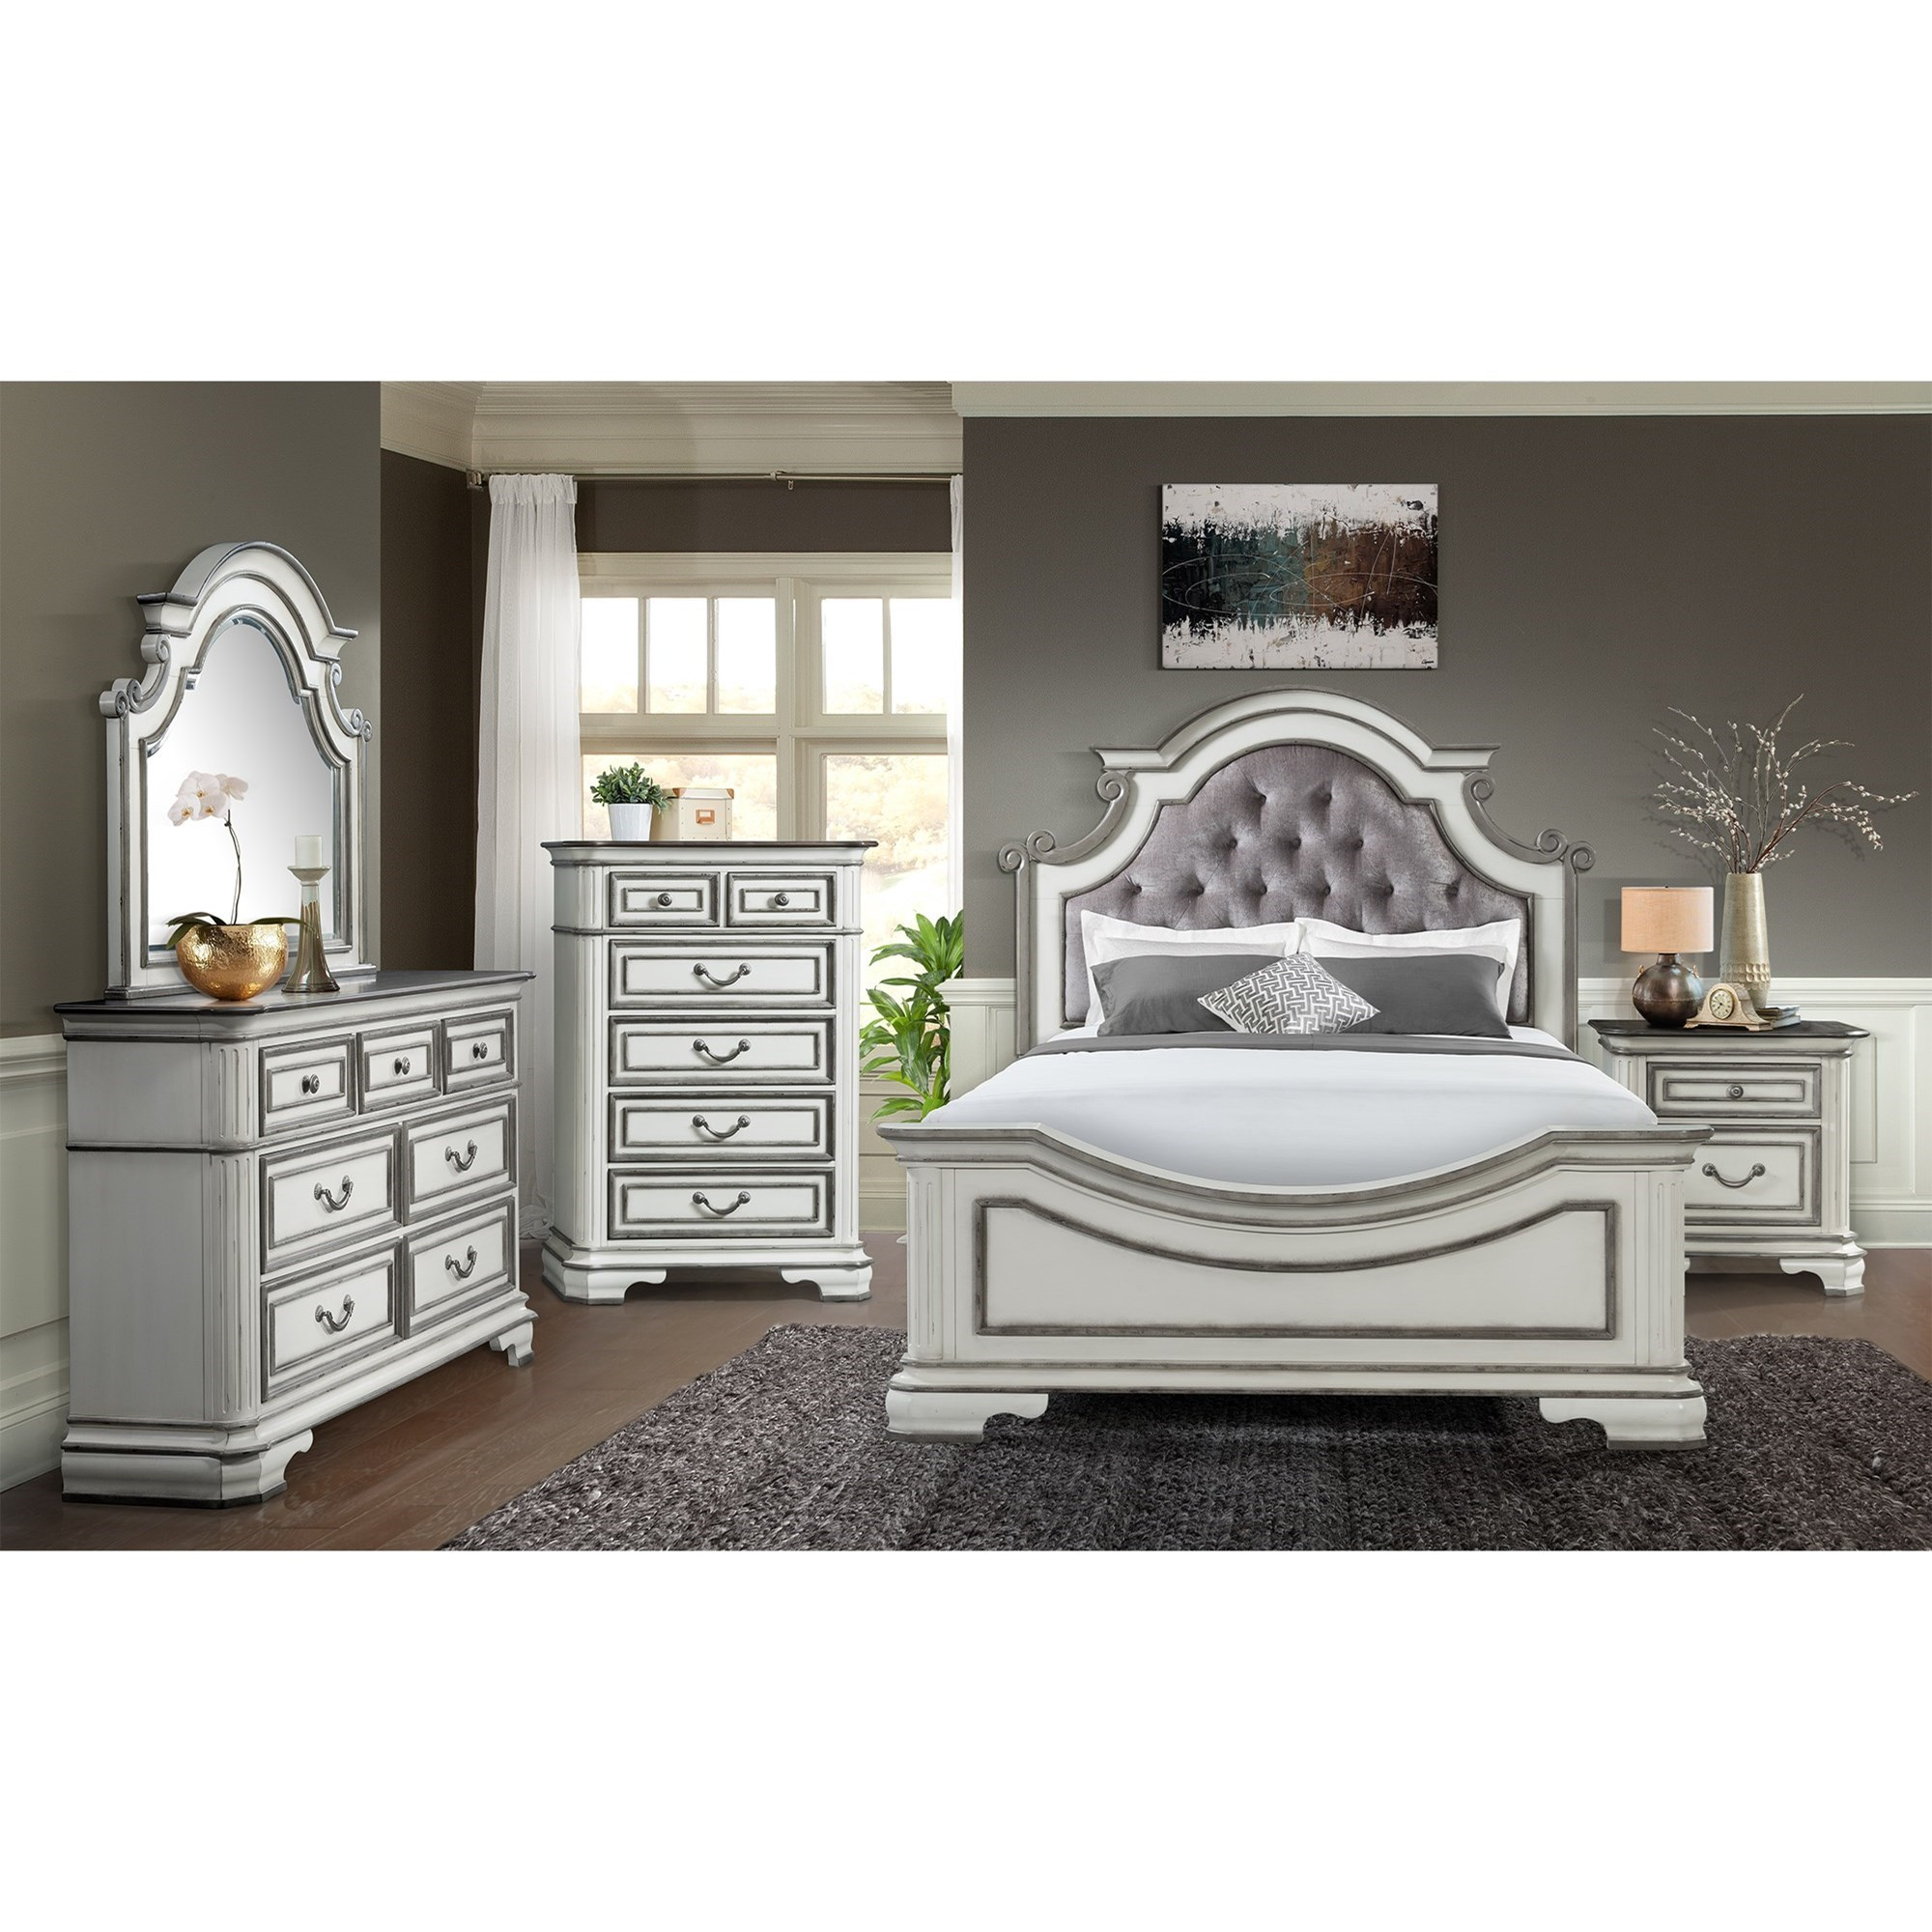 Elements Leighton Manor Queen 3 Piece Bedroom Group Royal Furniture Bedroom Groups